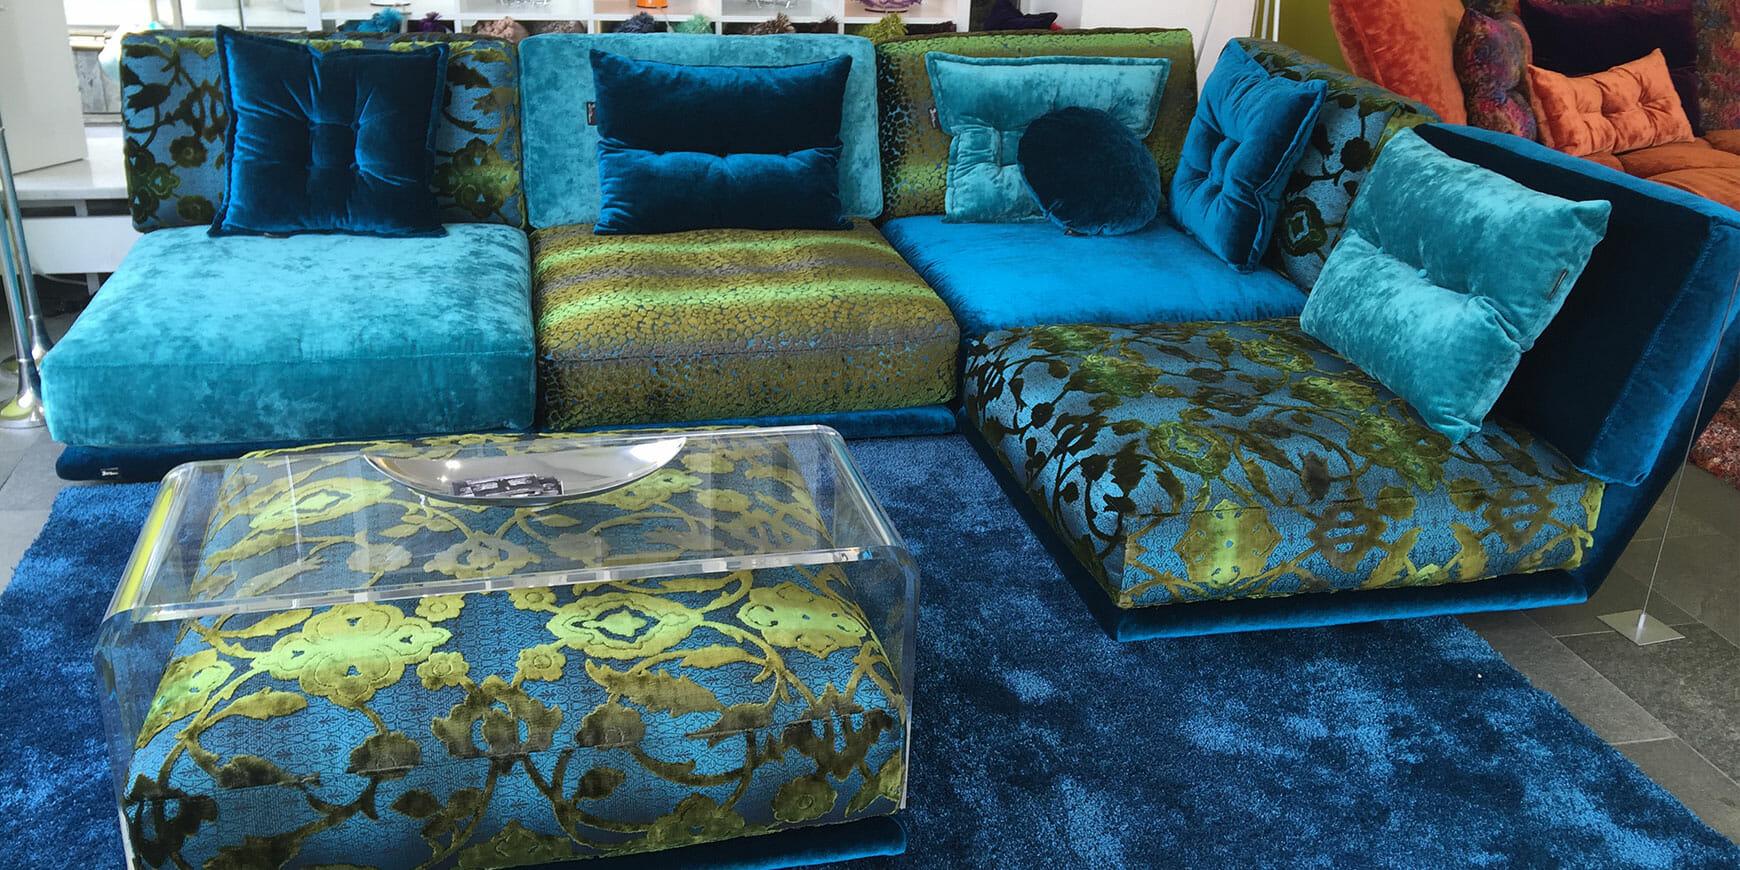 bretz napali ecksofa set 1 126 in blau t rkis mix bezug bretz designerm bel n rnberg. Black Bedroom Furniture Sets. Home Design Ideas